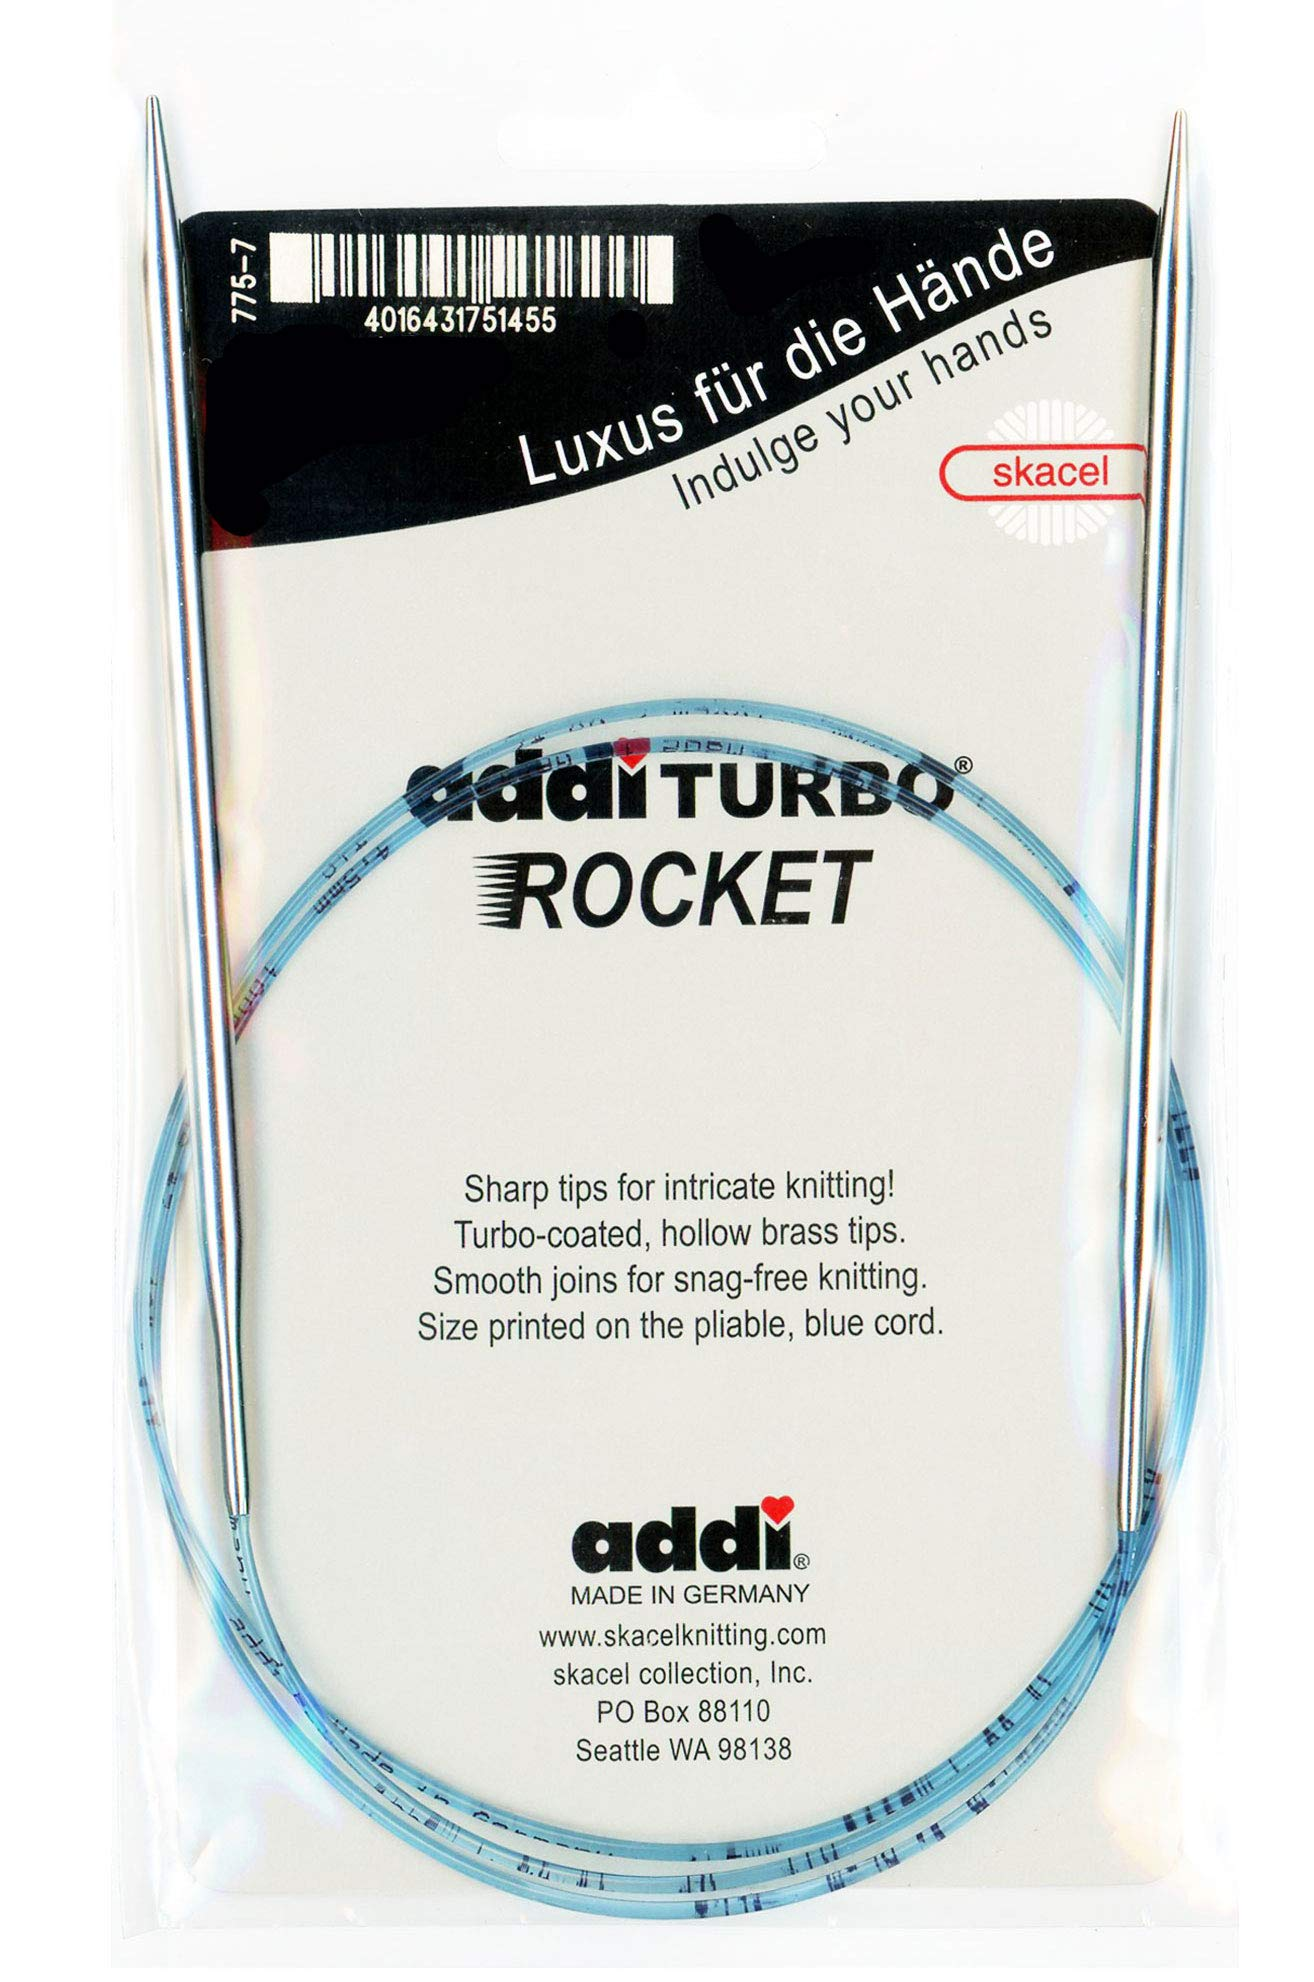 addi Knitting Needle Circular Turbo Rocket Lace Skacel Exclusive Blue Cord 40 inch (100cm) Size US 07 (4.5mm)